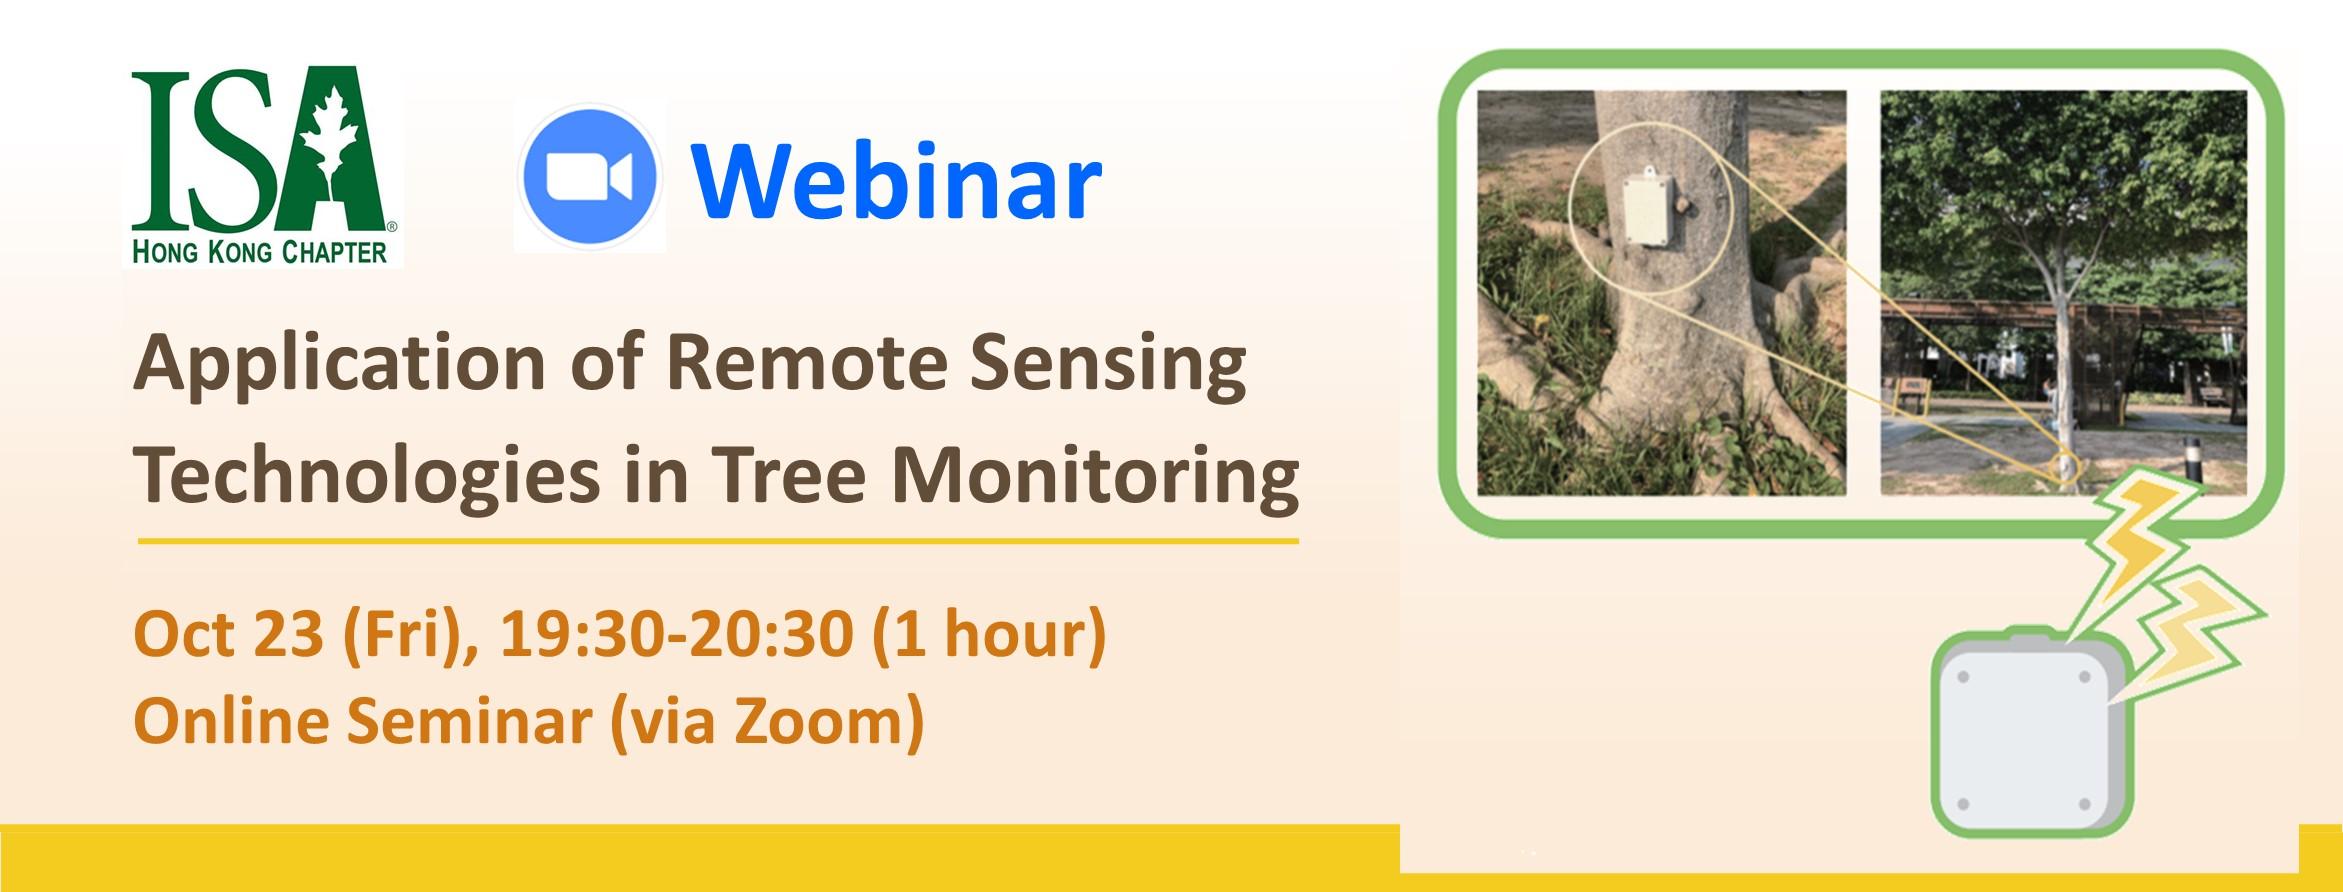 Webinar: Application of Remote Sensing Technologies in Tree Monitoring